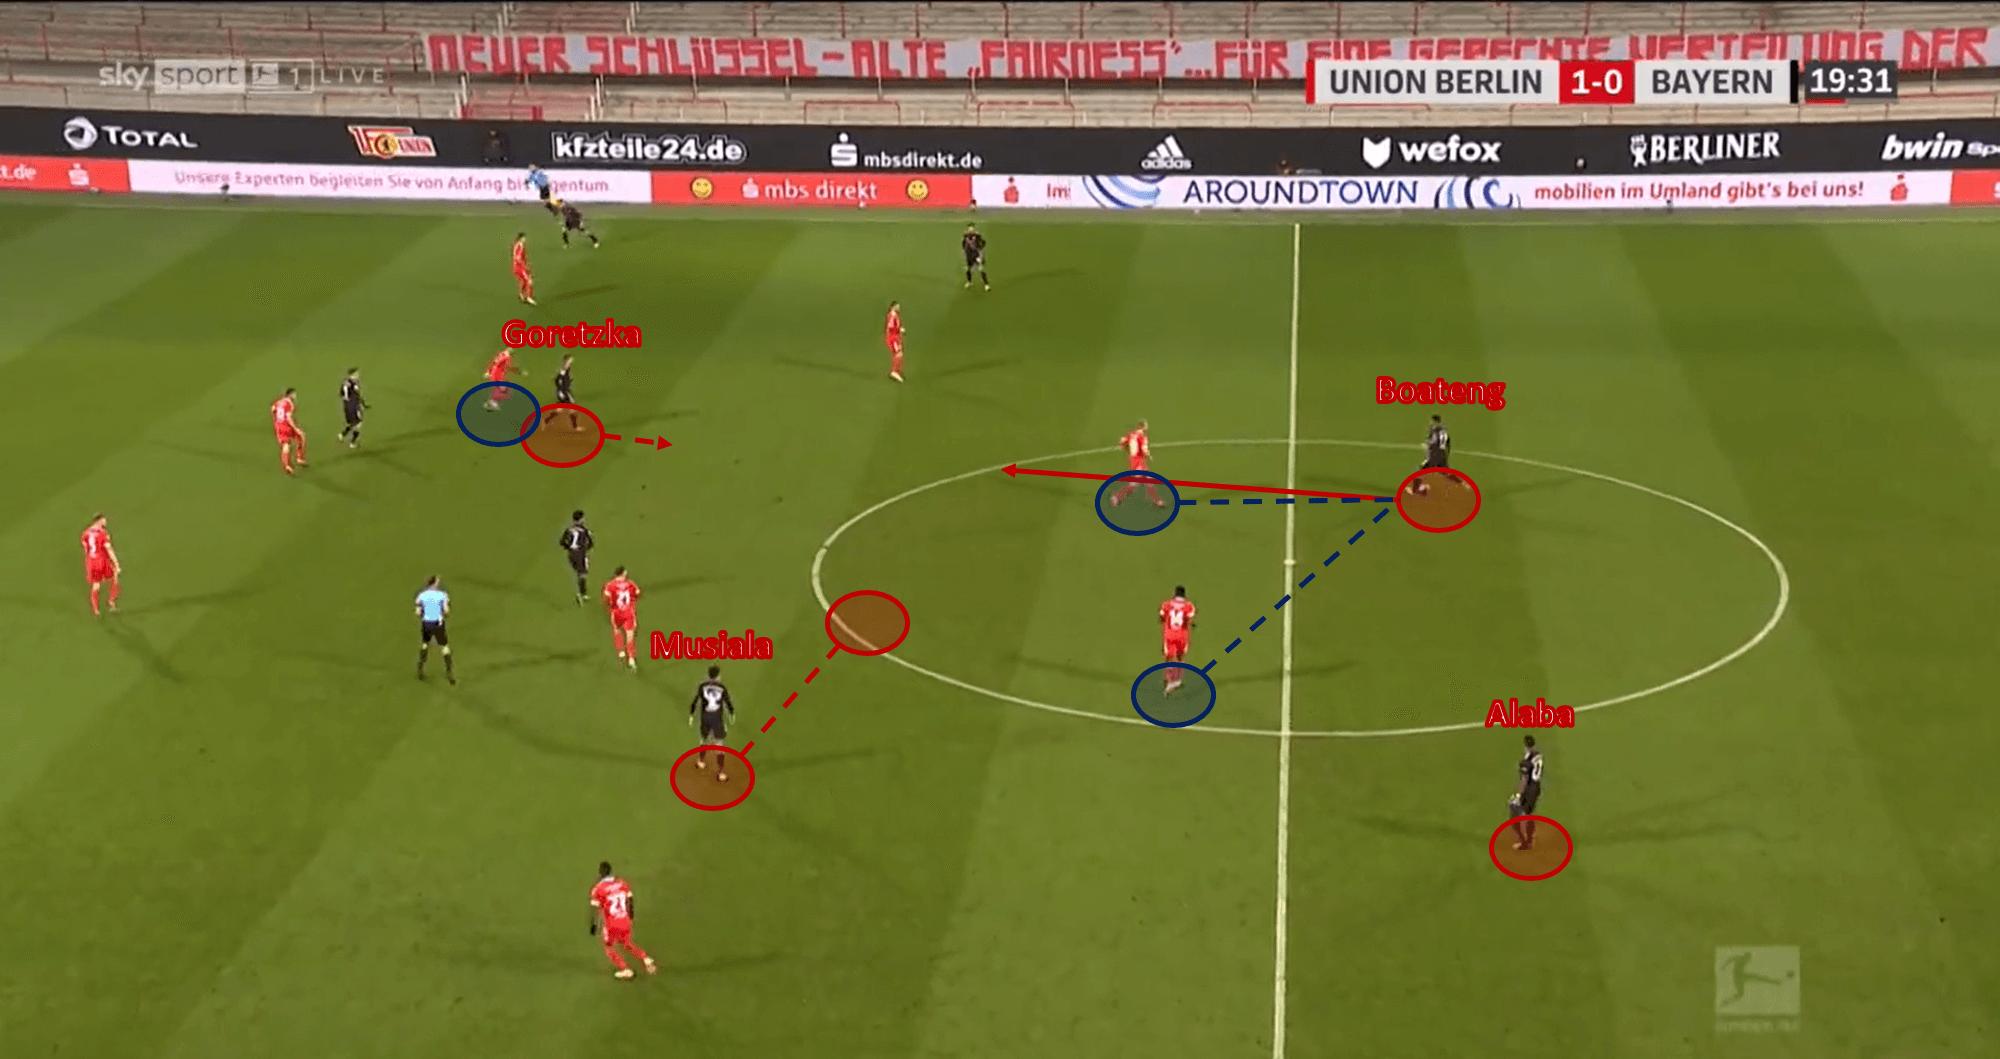 Bundesliga 2020/21: Union Berlin vs Bayern Munich – tactical analysis - tactics